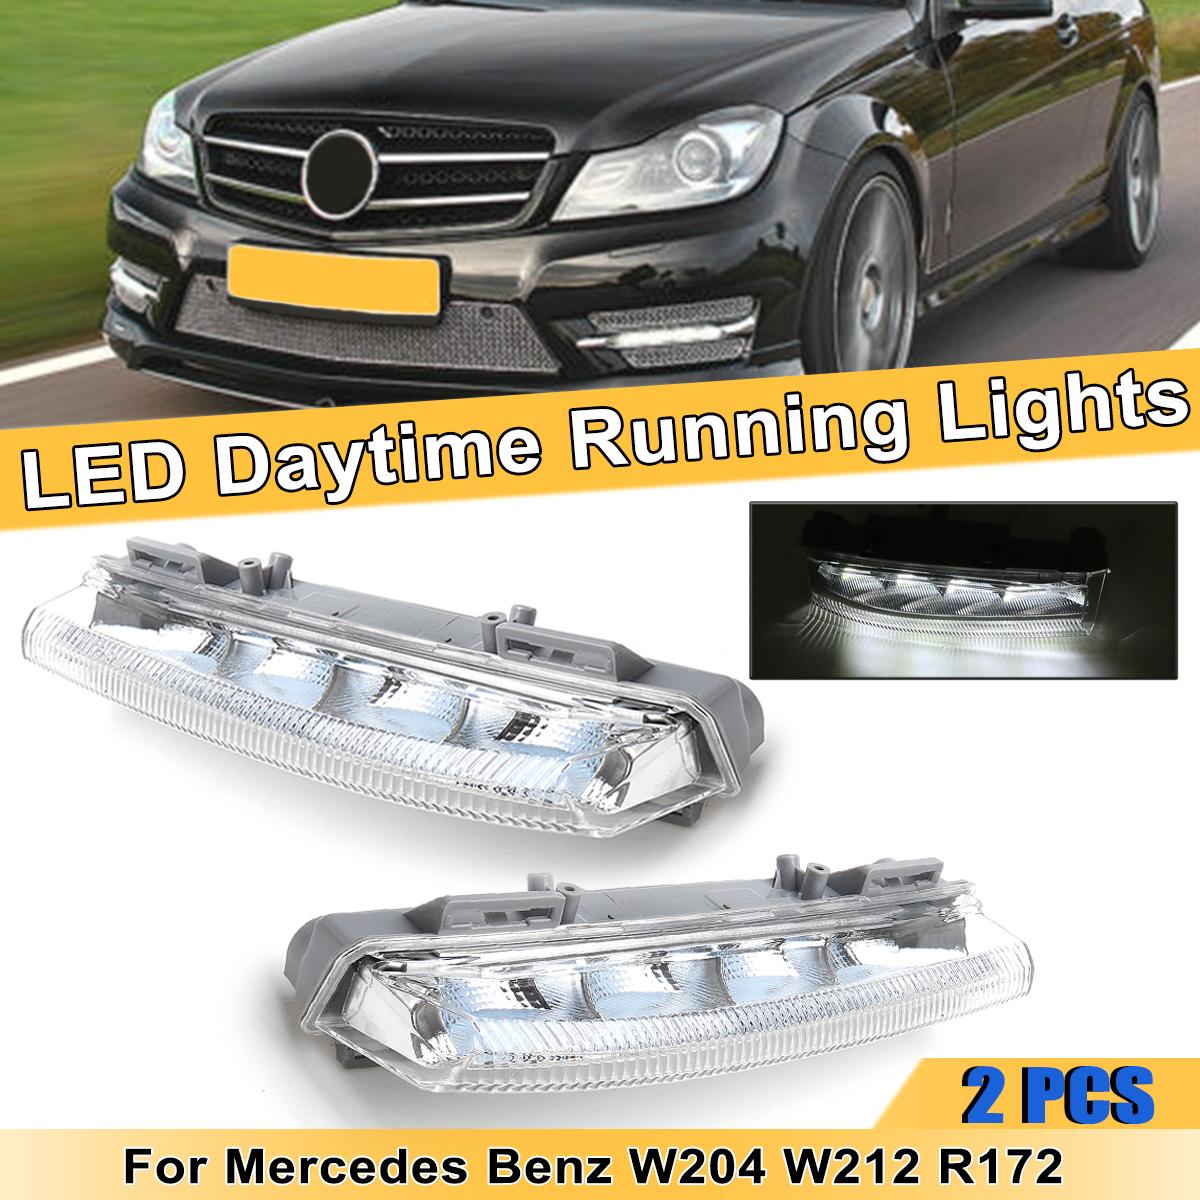 12V Car LED DRL Daytime Running Lights Fog Lamp for Mercedes for Benz W204 W212 R172